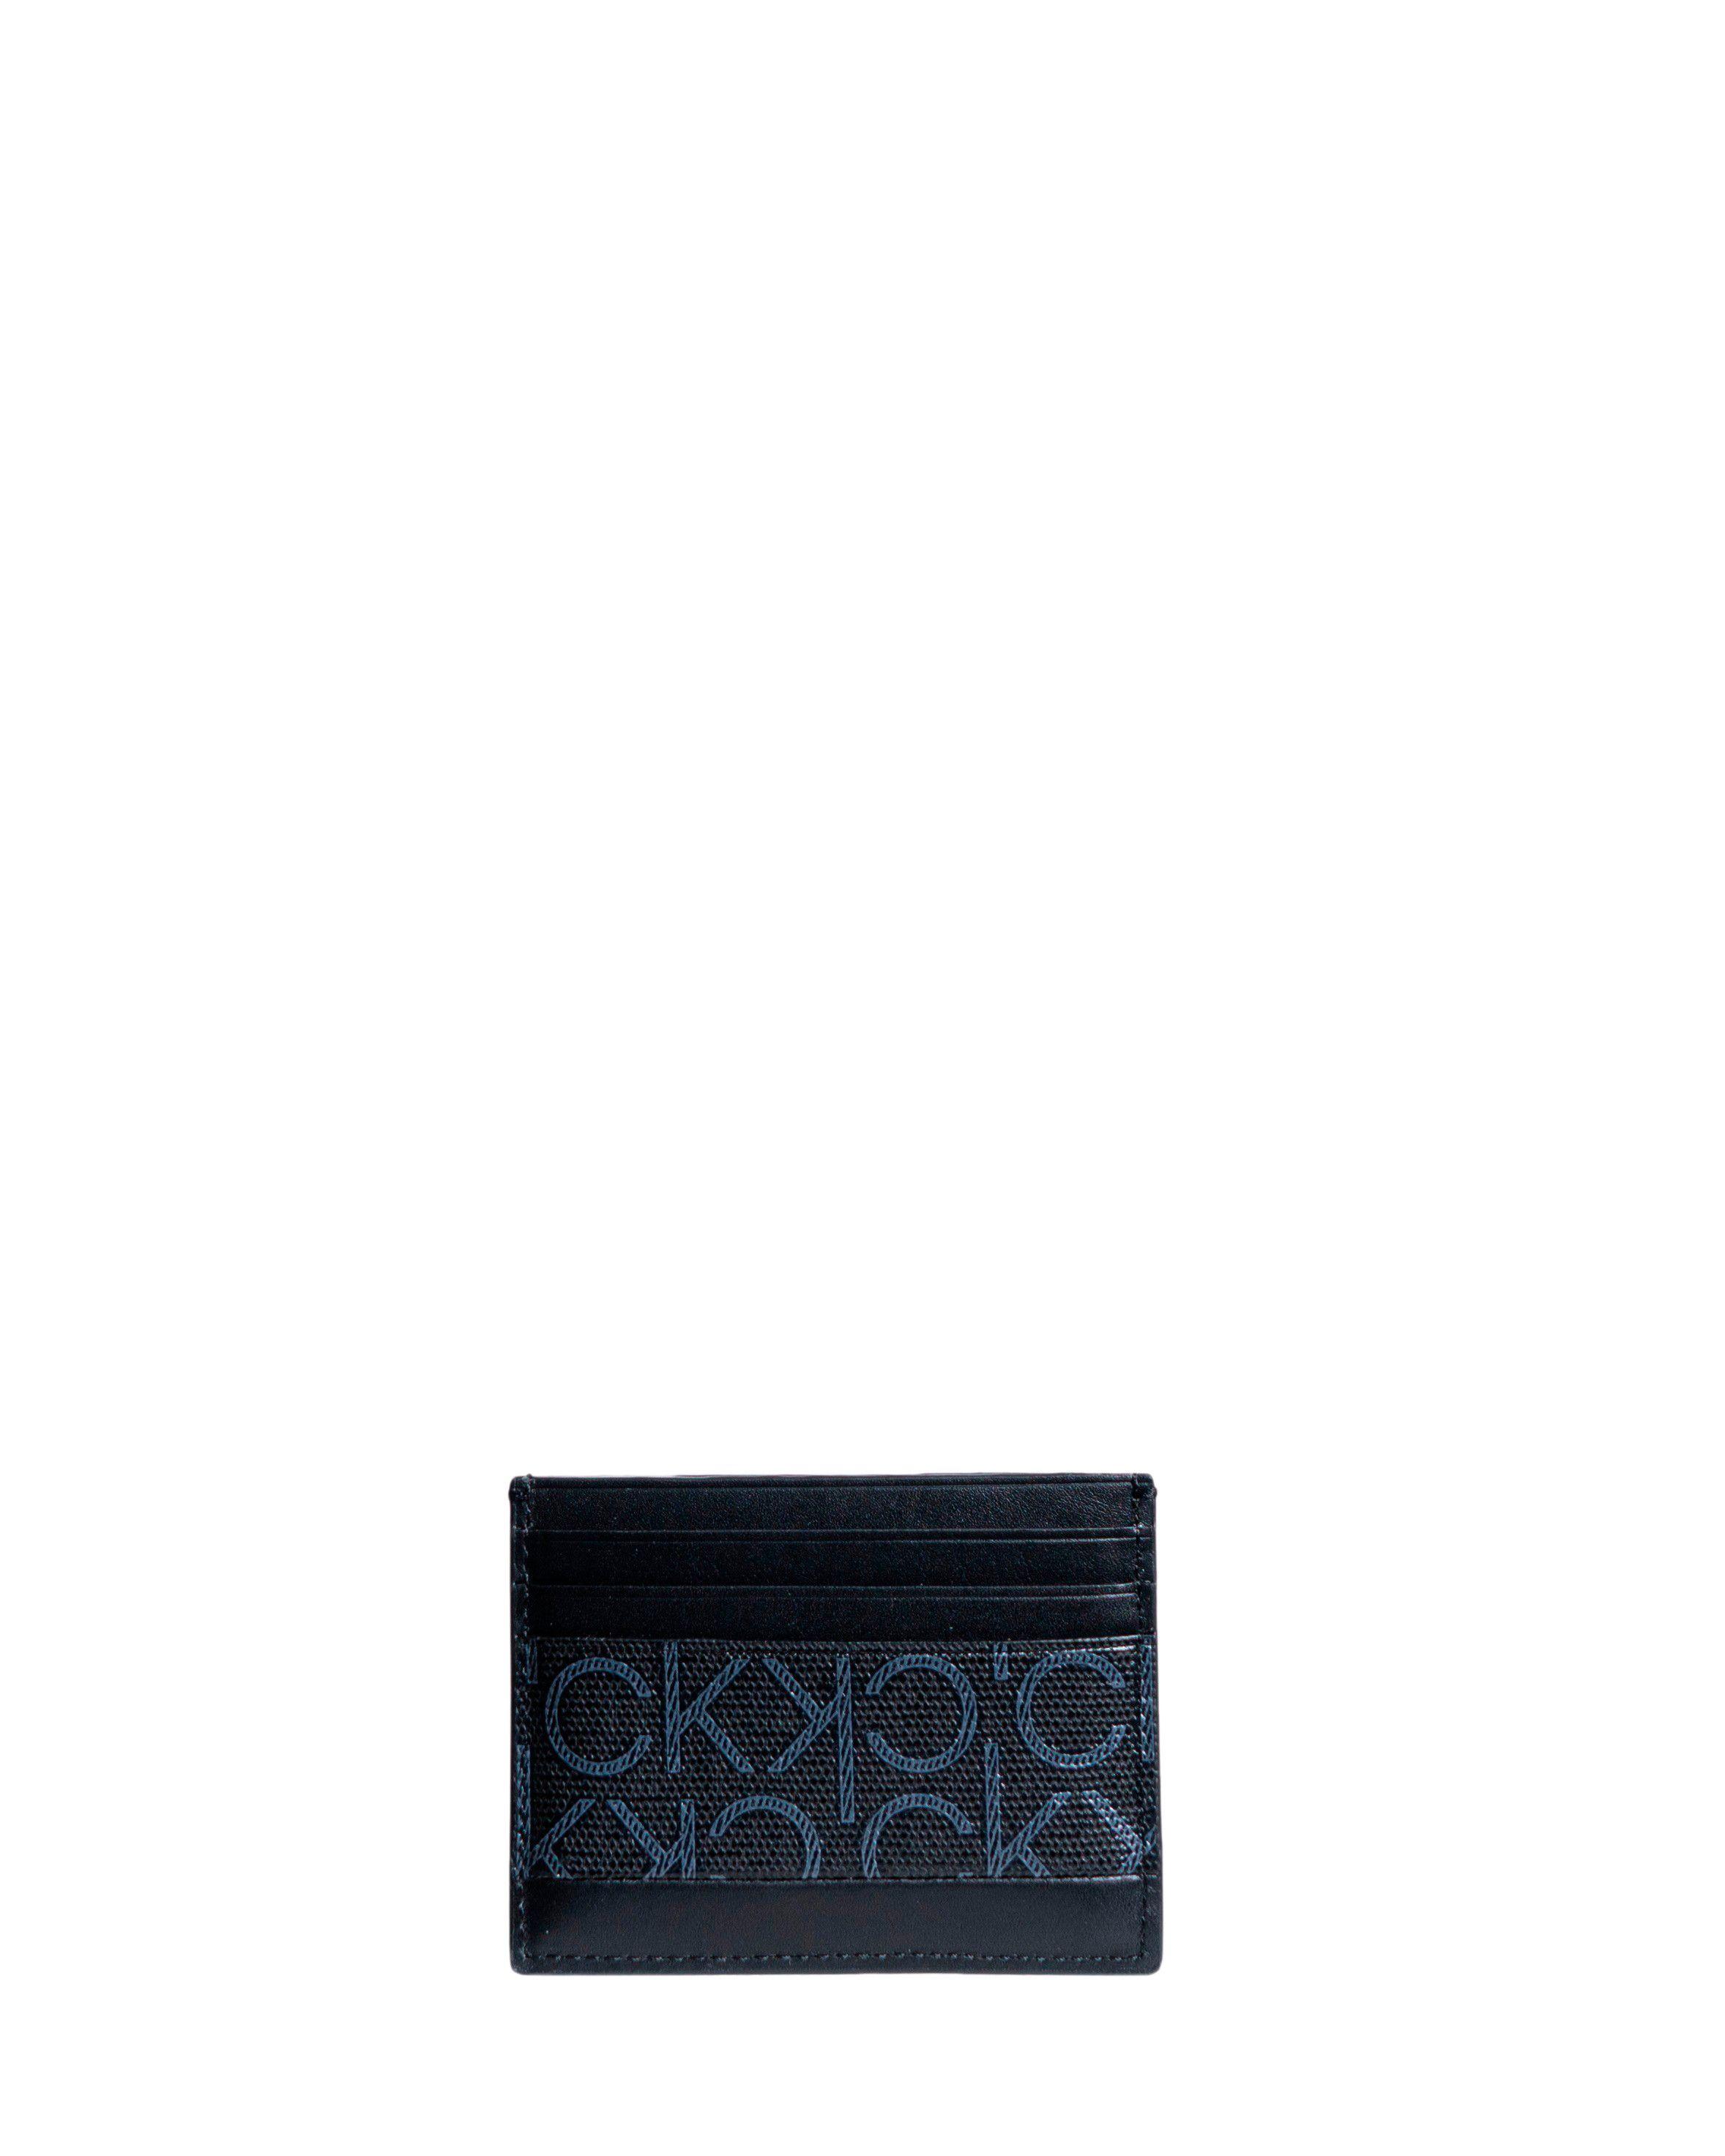 Calvin Klein Men's Wallet In Black